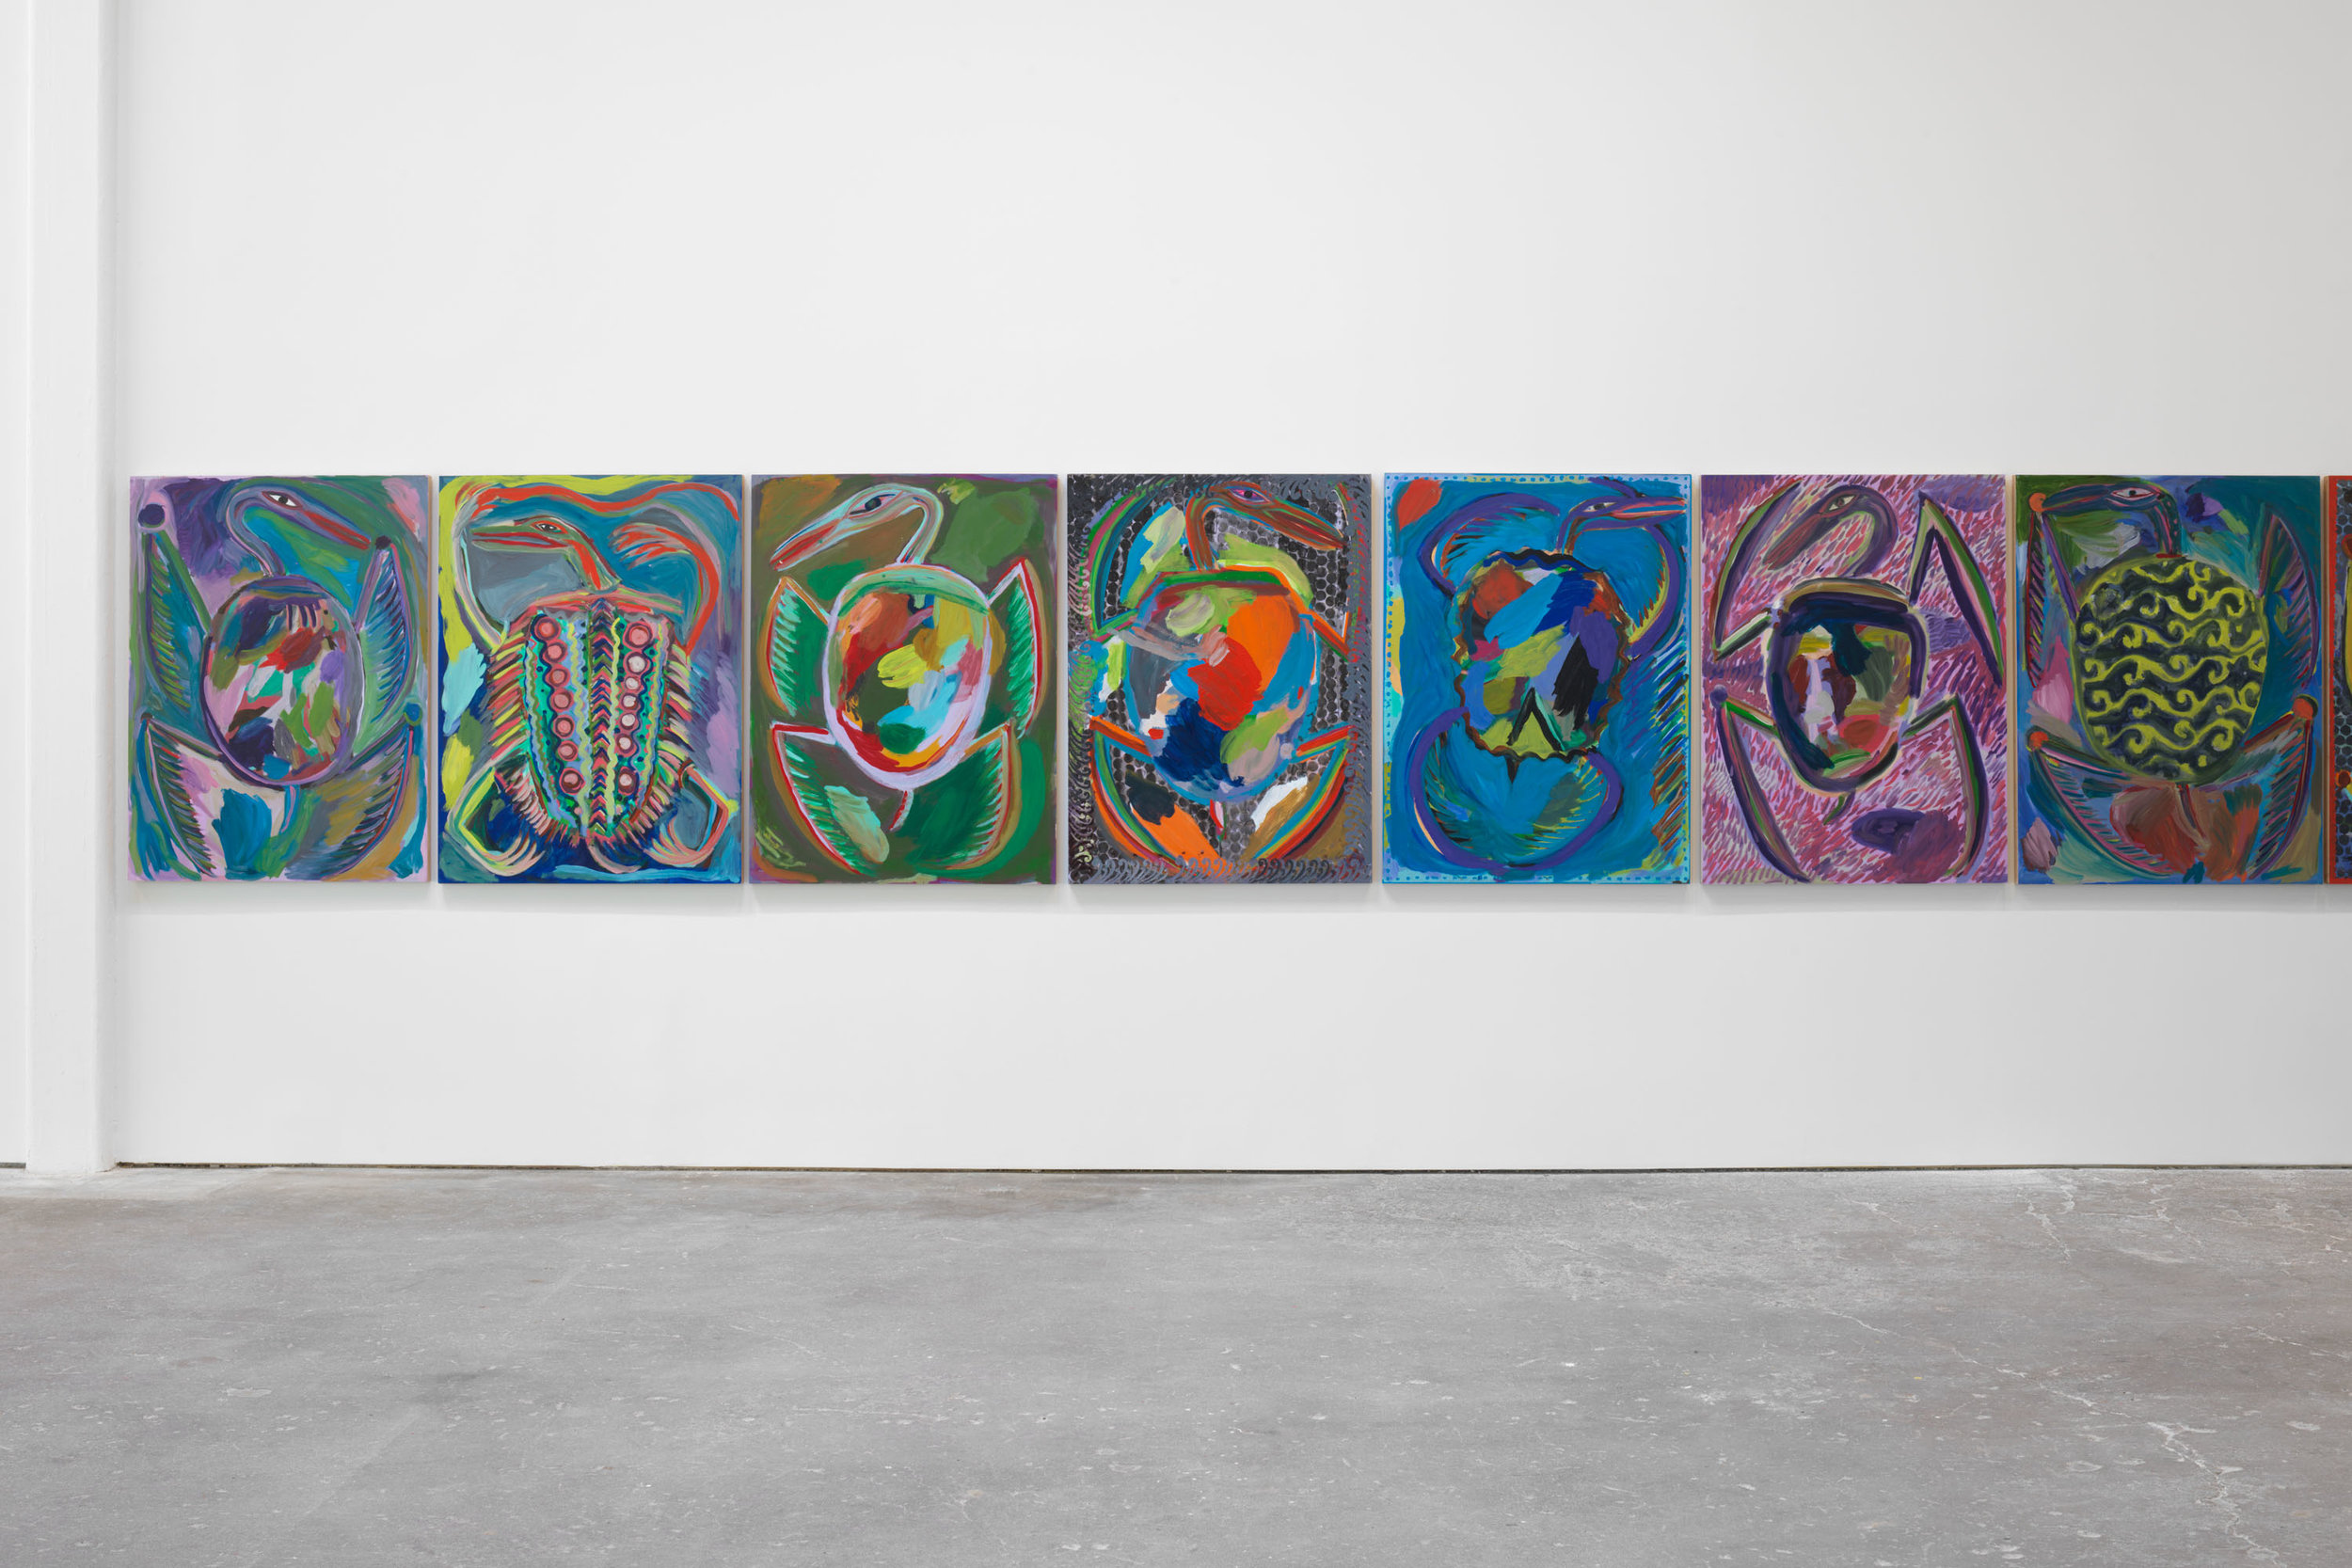 Installation view,  Josh Smith: Emo Jungle , David Zwirner, New York, 2019. Courtesy David Zwirn.